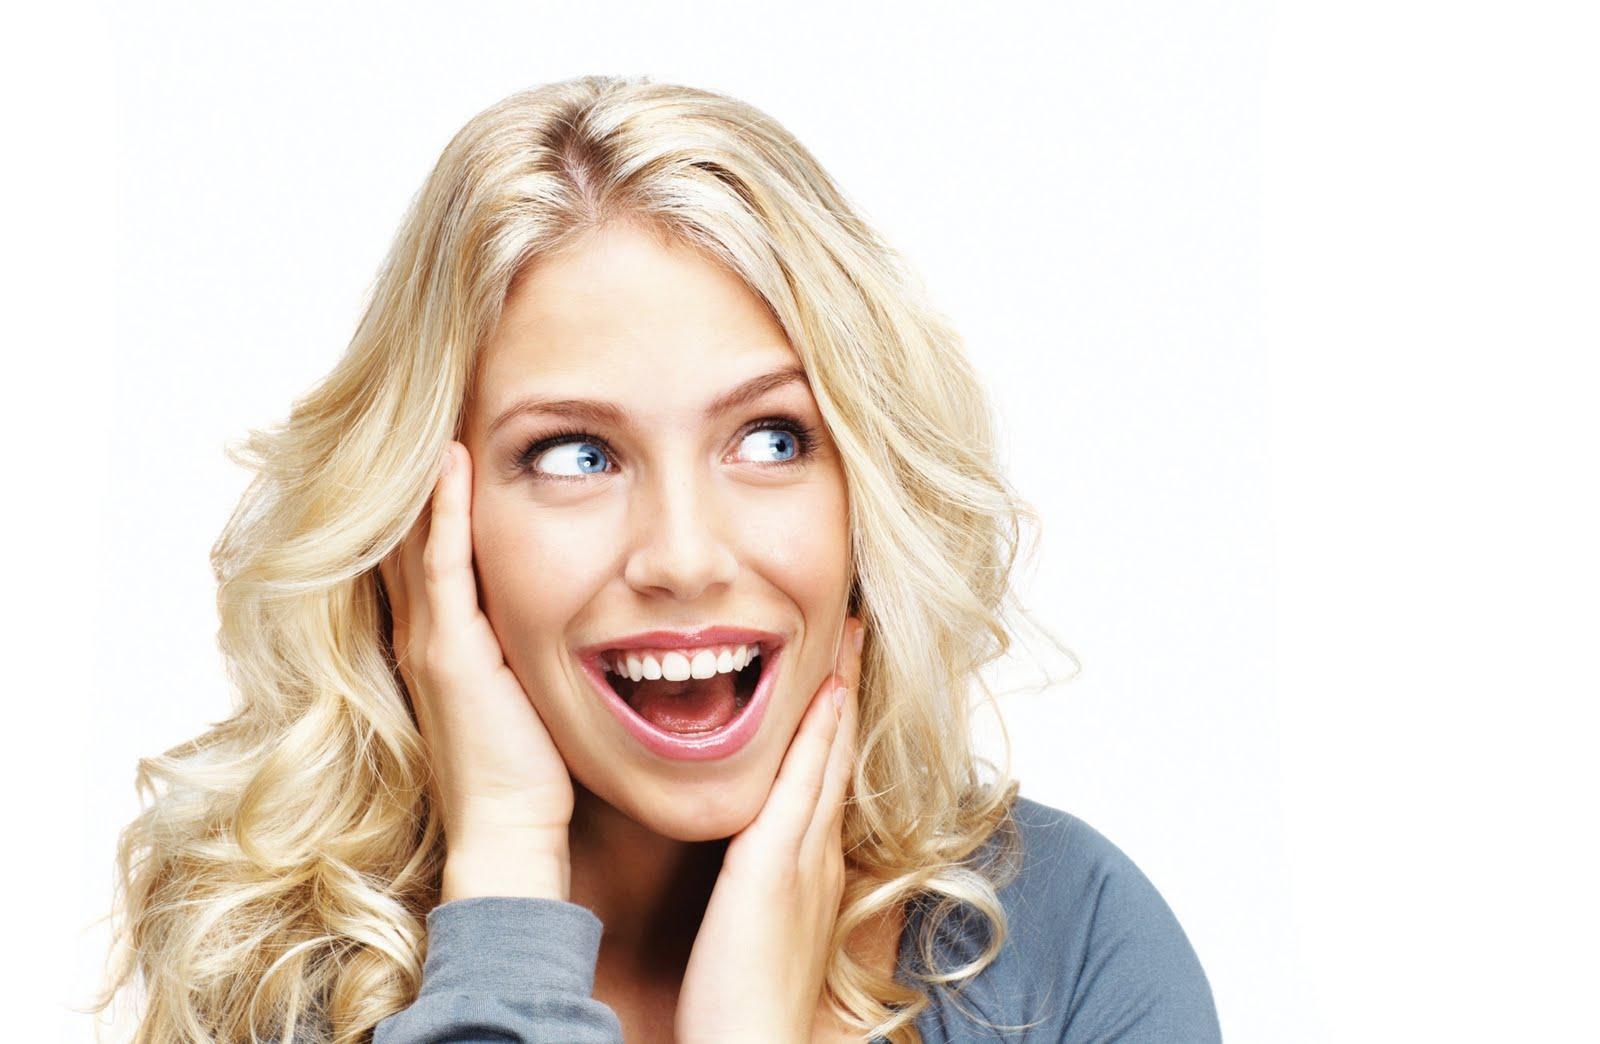 seguros dentales en california